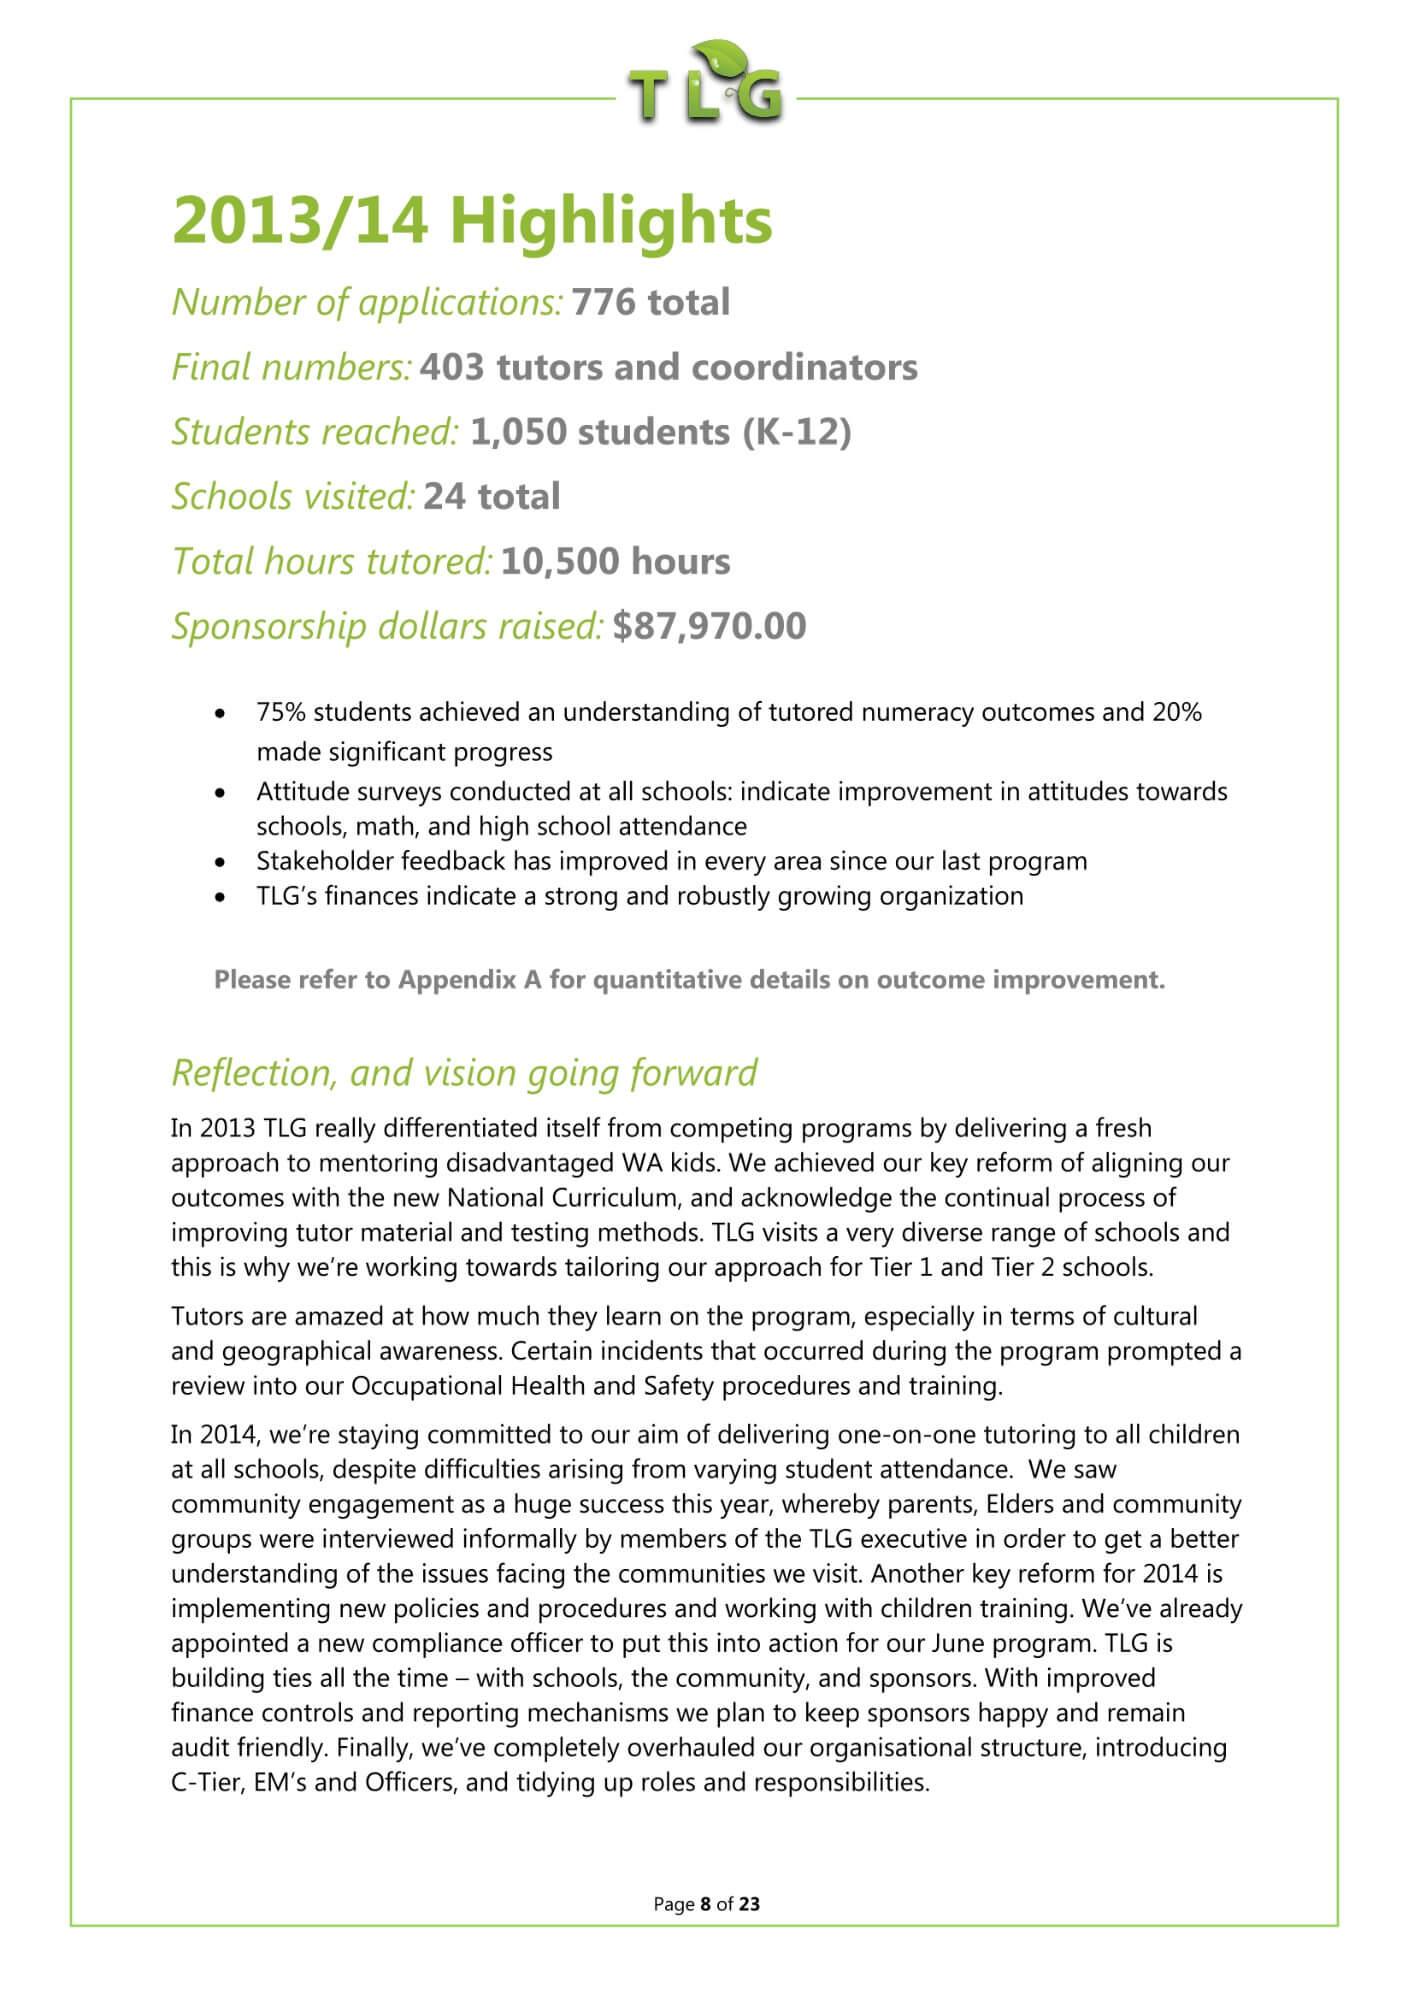 tlg-annual-report-FY13-08.jpg